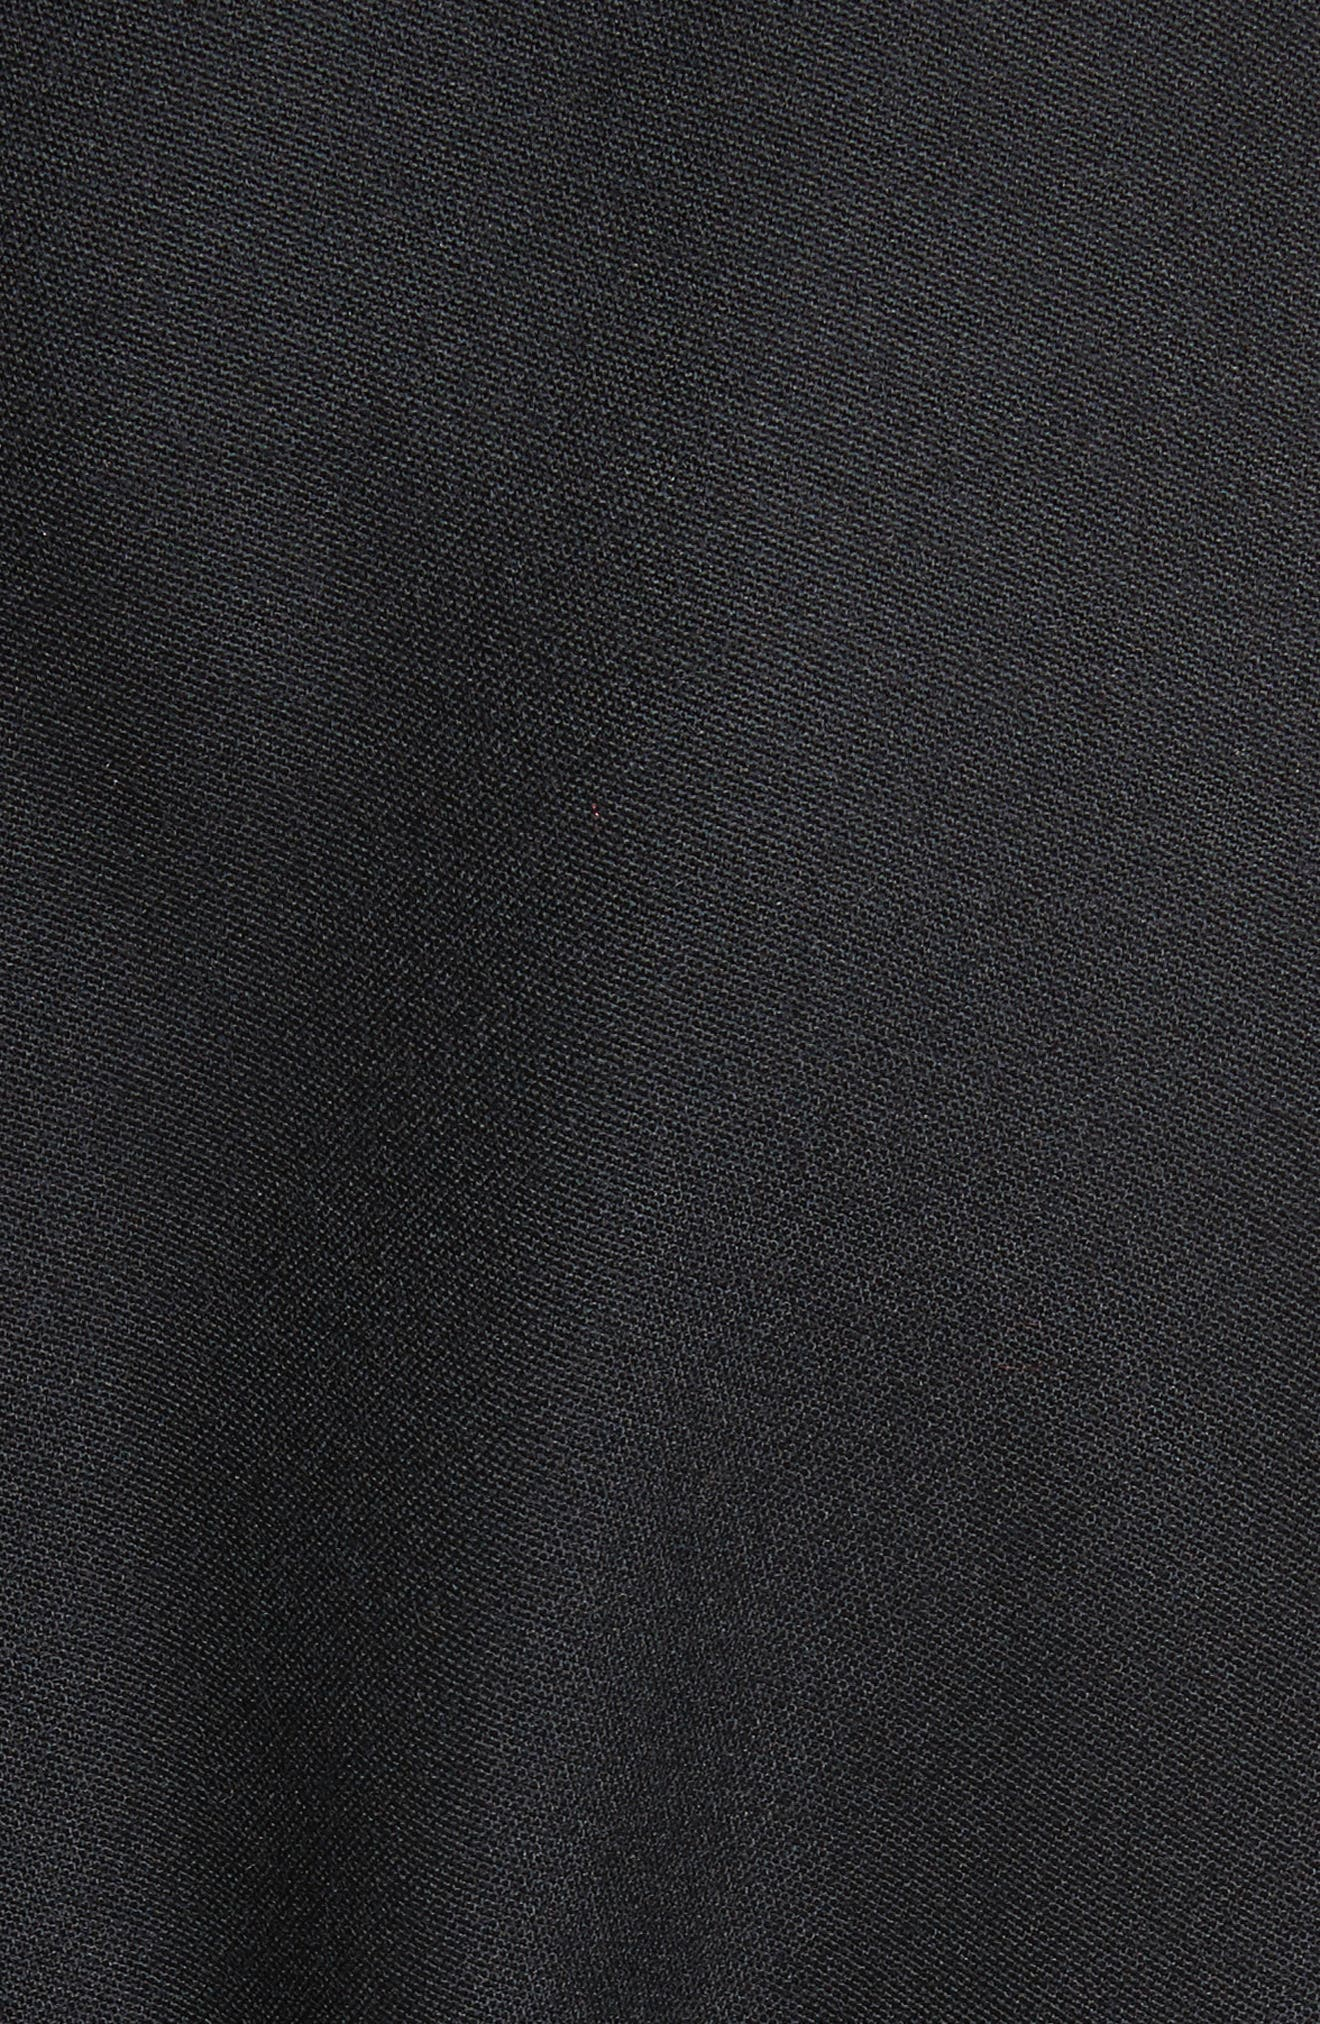 Eden Alter Leather Trim Wool Coat,                             Alternate thumbnail 6, color,                             001